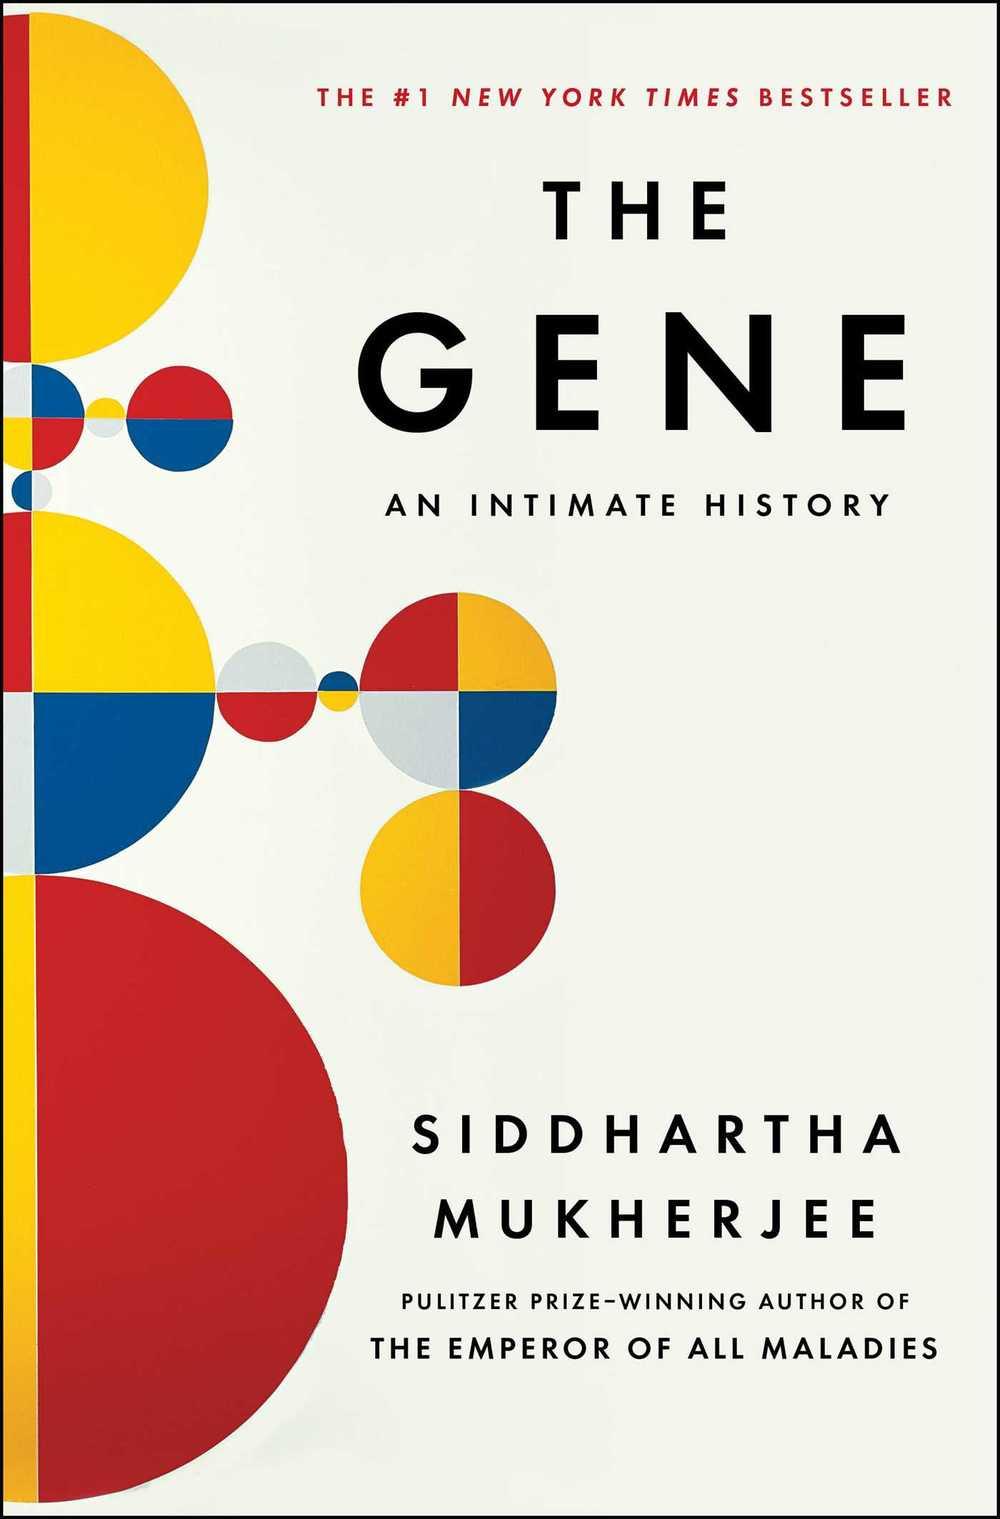 The Geneby Siddhartha Mukherjee (US Edition)